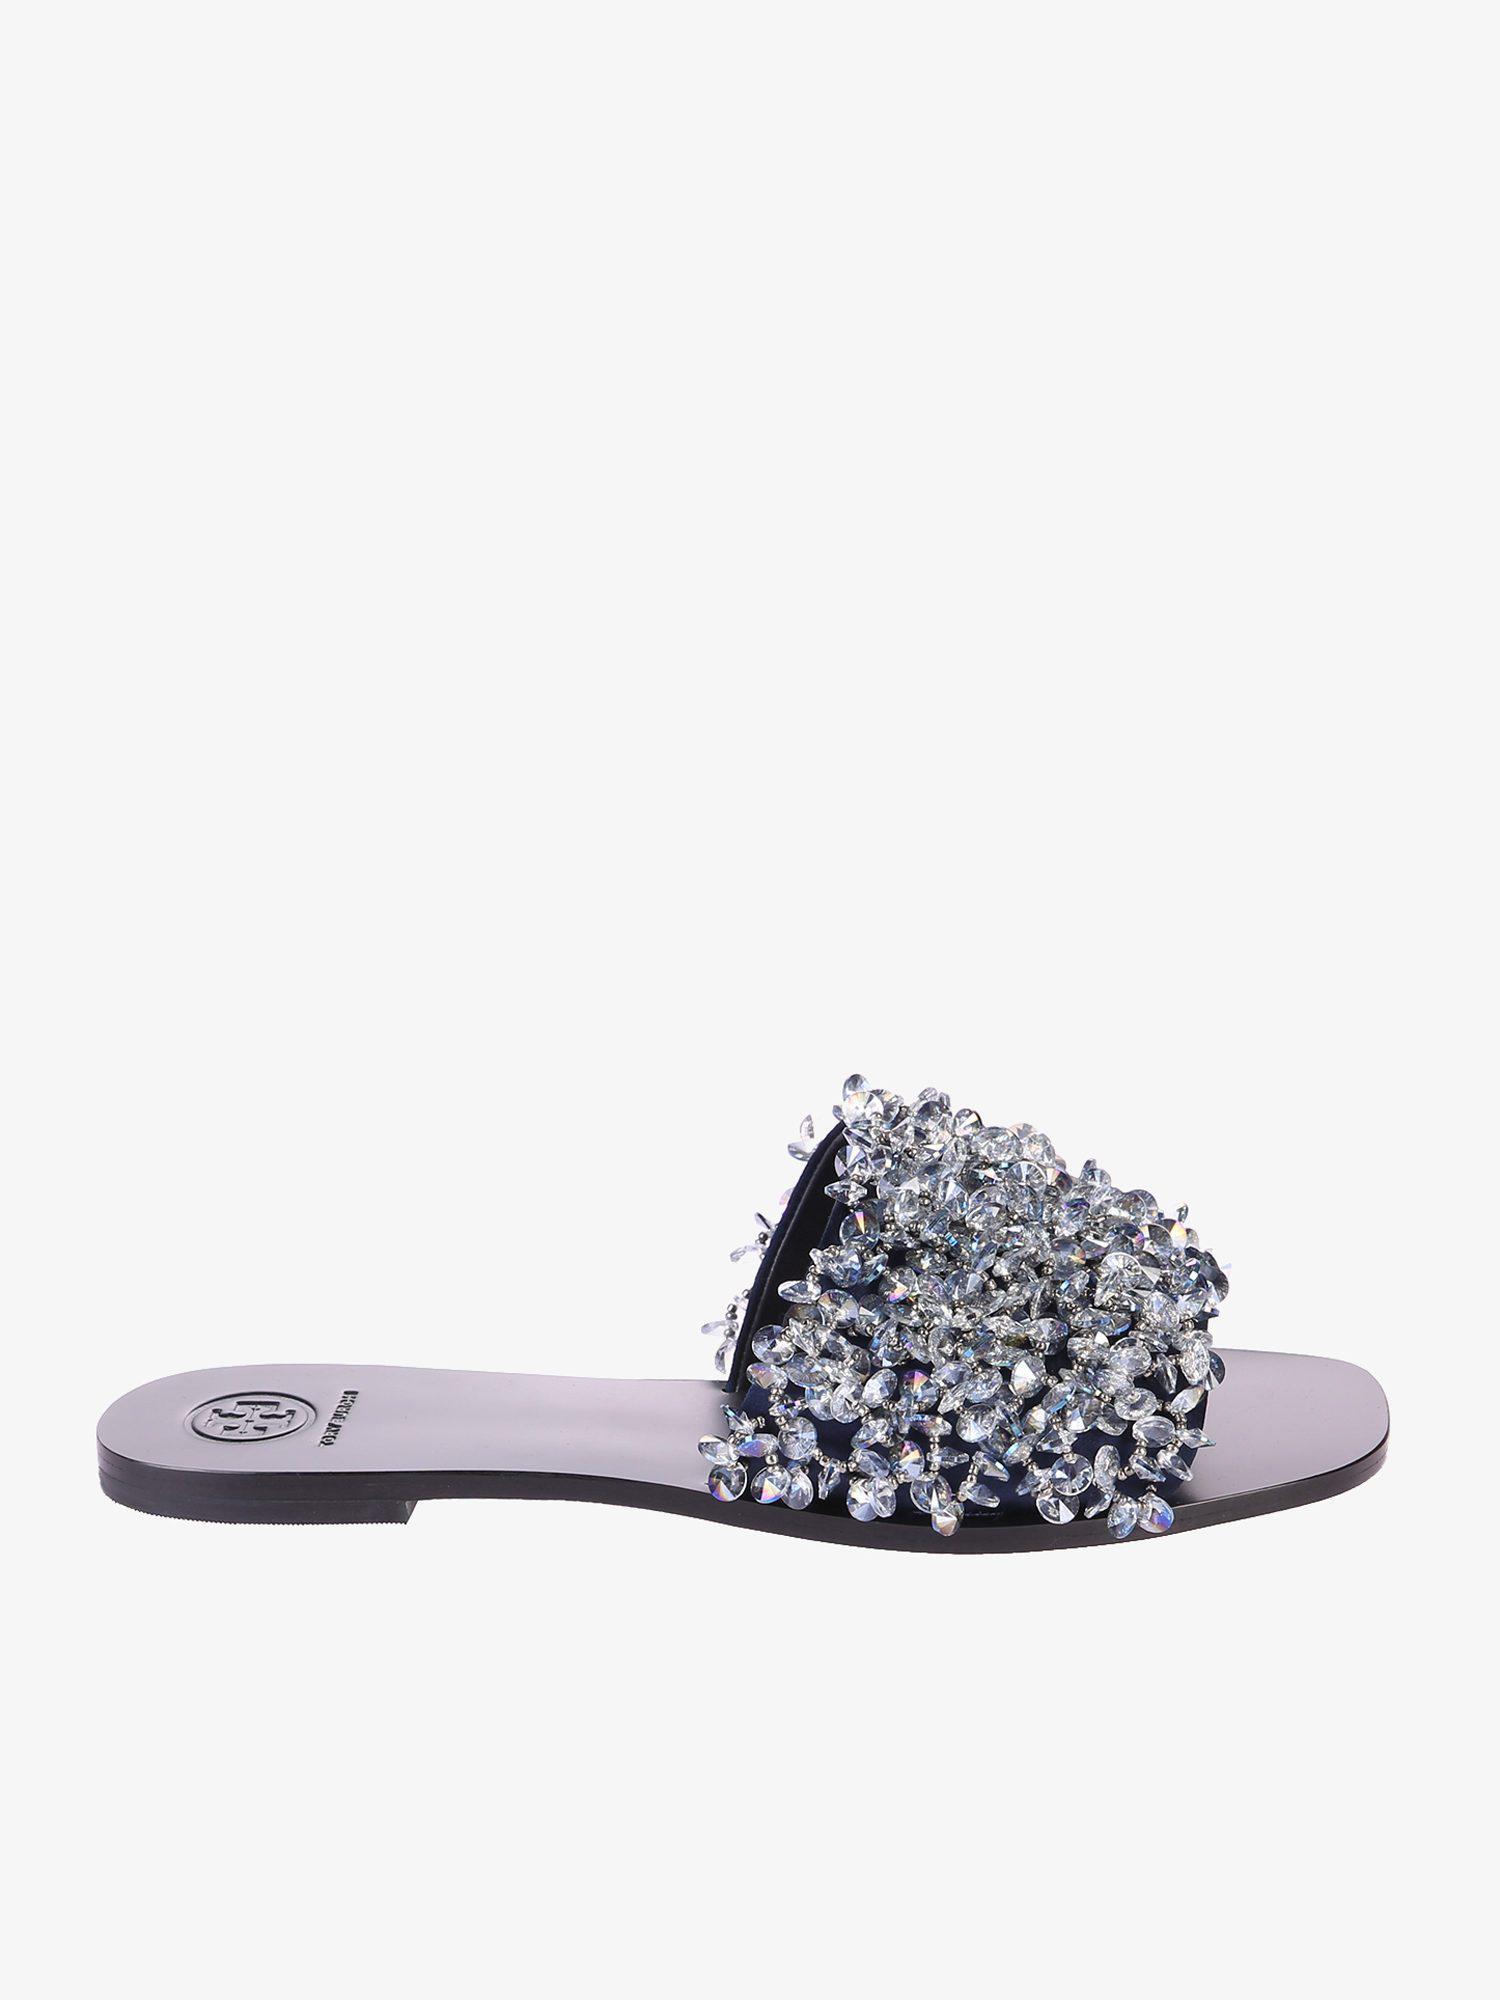 3b8fede0e217 Lyst - Tory Burch Logan Embellished Slide Sandals